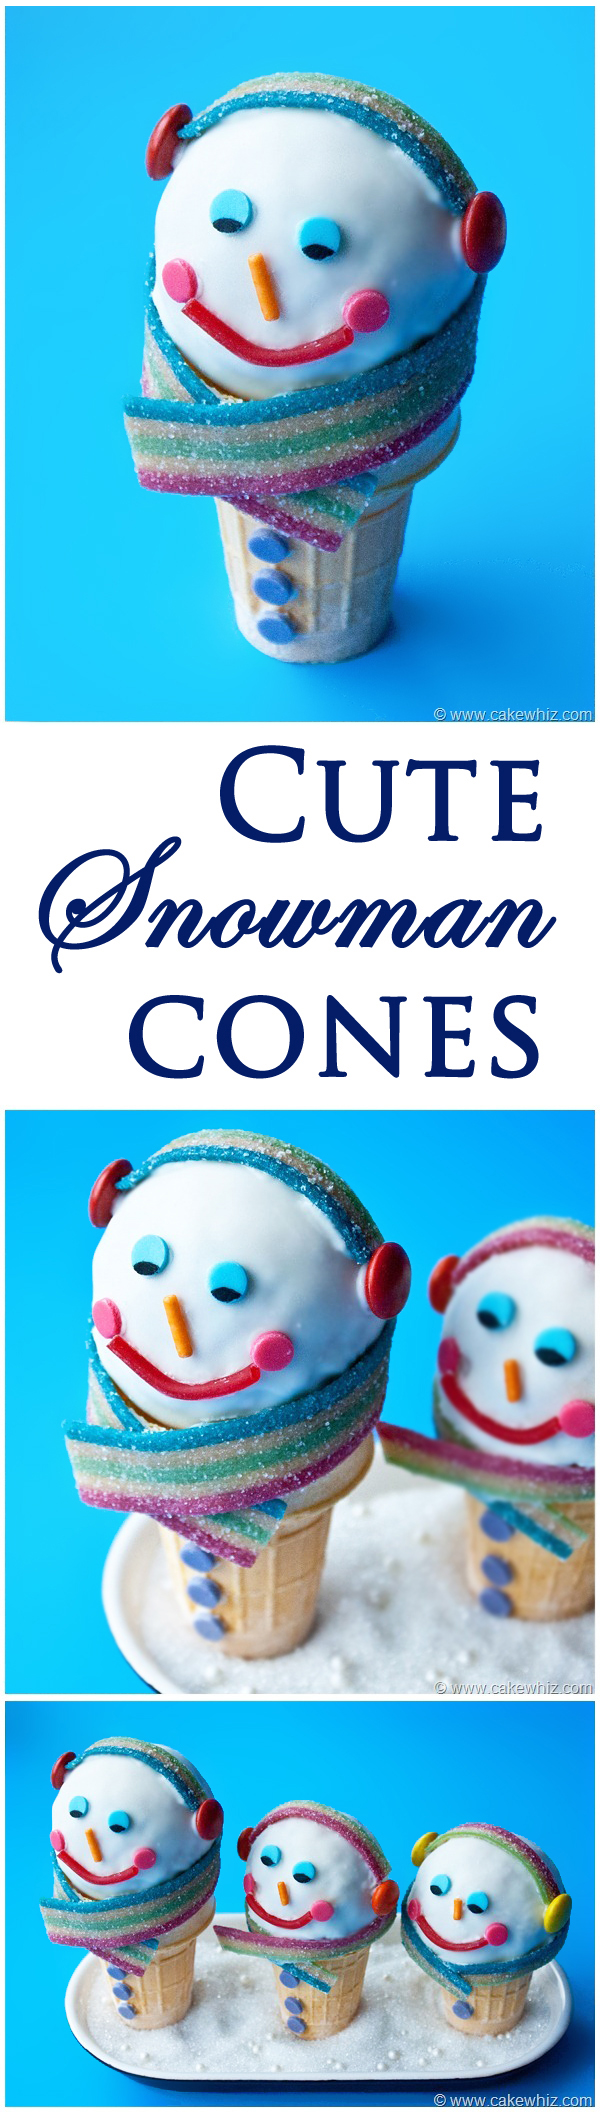 Cute snowman cones...From cakewhiz.com #delicious #recipe #cake #desserts #dessertrecipes #yummy #delicious #food #sweet